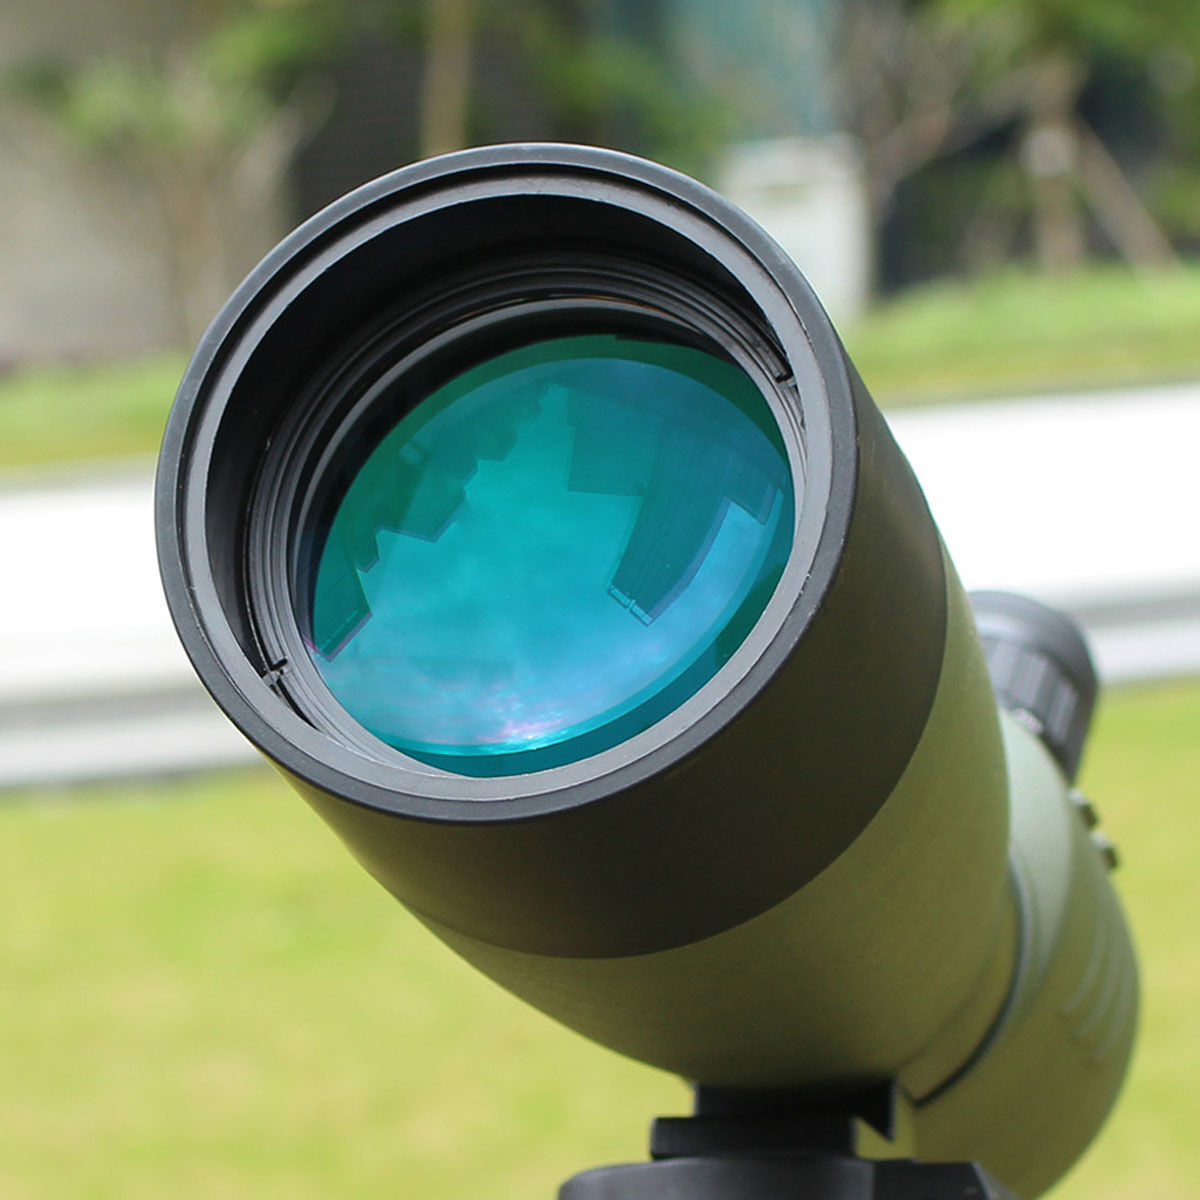 SVBONY FMC 25-75x70mm w/ Angled Zoom Spotting Scope w/ 25-75x70mm Tripod &Cell Phone Adapter 2b4e86